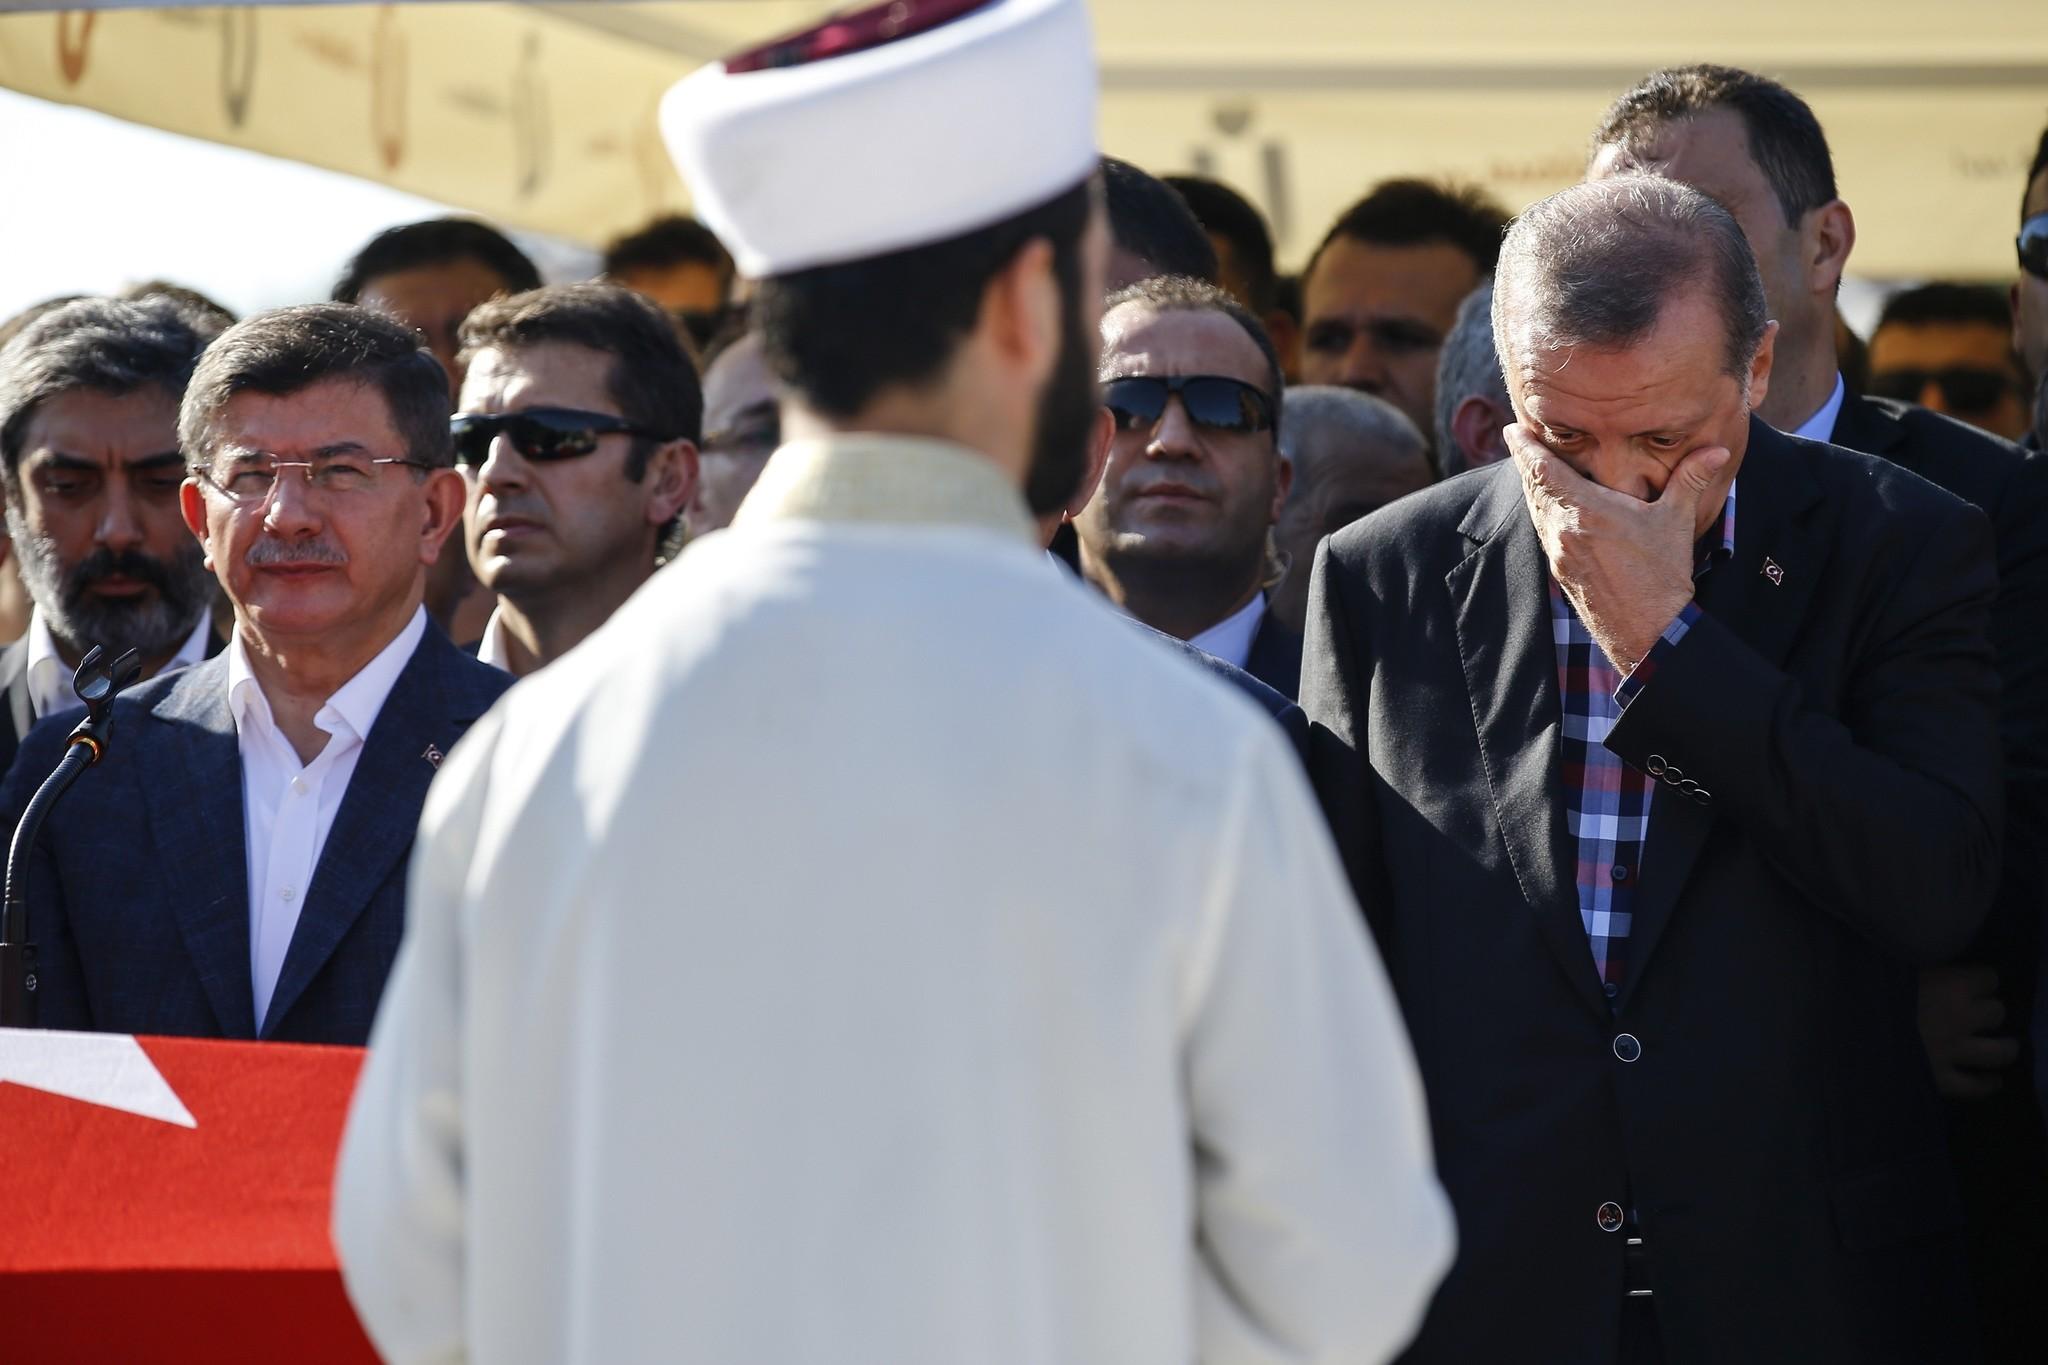 Turkish President Recep Tayyip Erdogan right, wipes his tears during the funeral of Mustafa Cambaz, Erol and Abdullah Olcak.